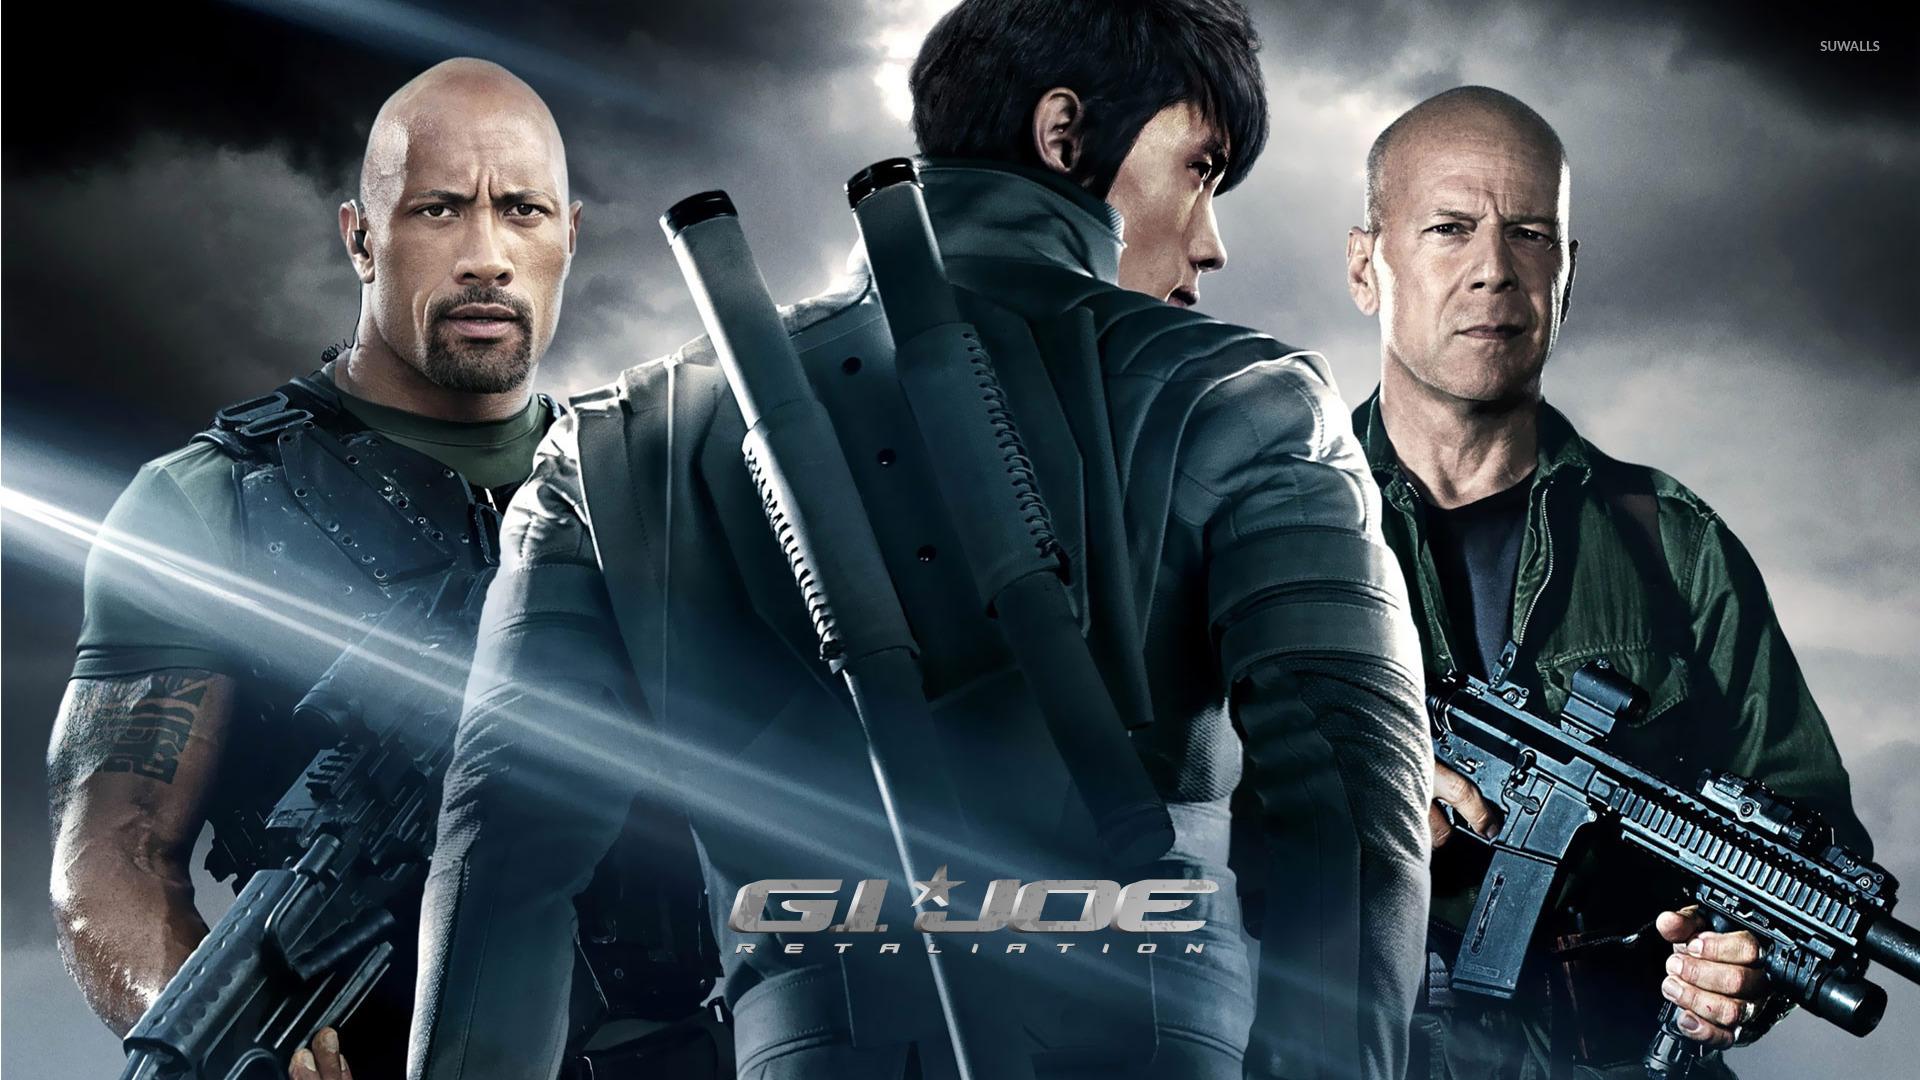 G.I. Joe: Retaliation [4] wallpaper - Movie wallpapers ...